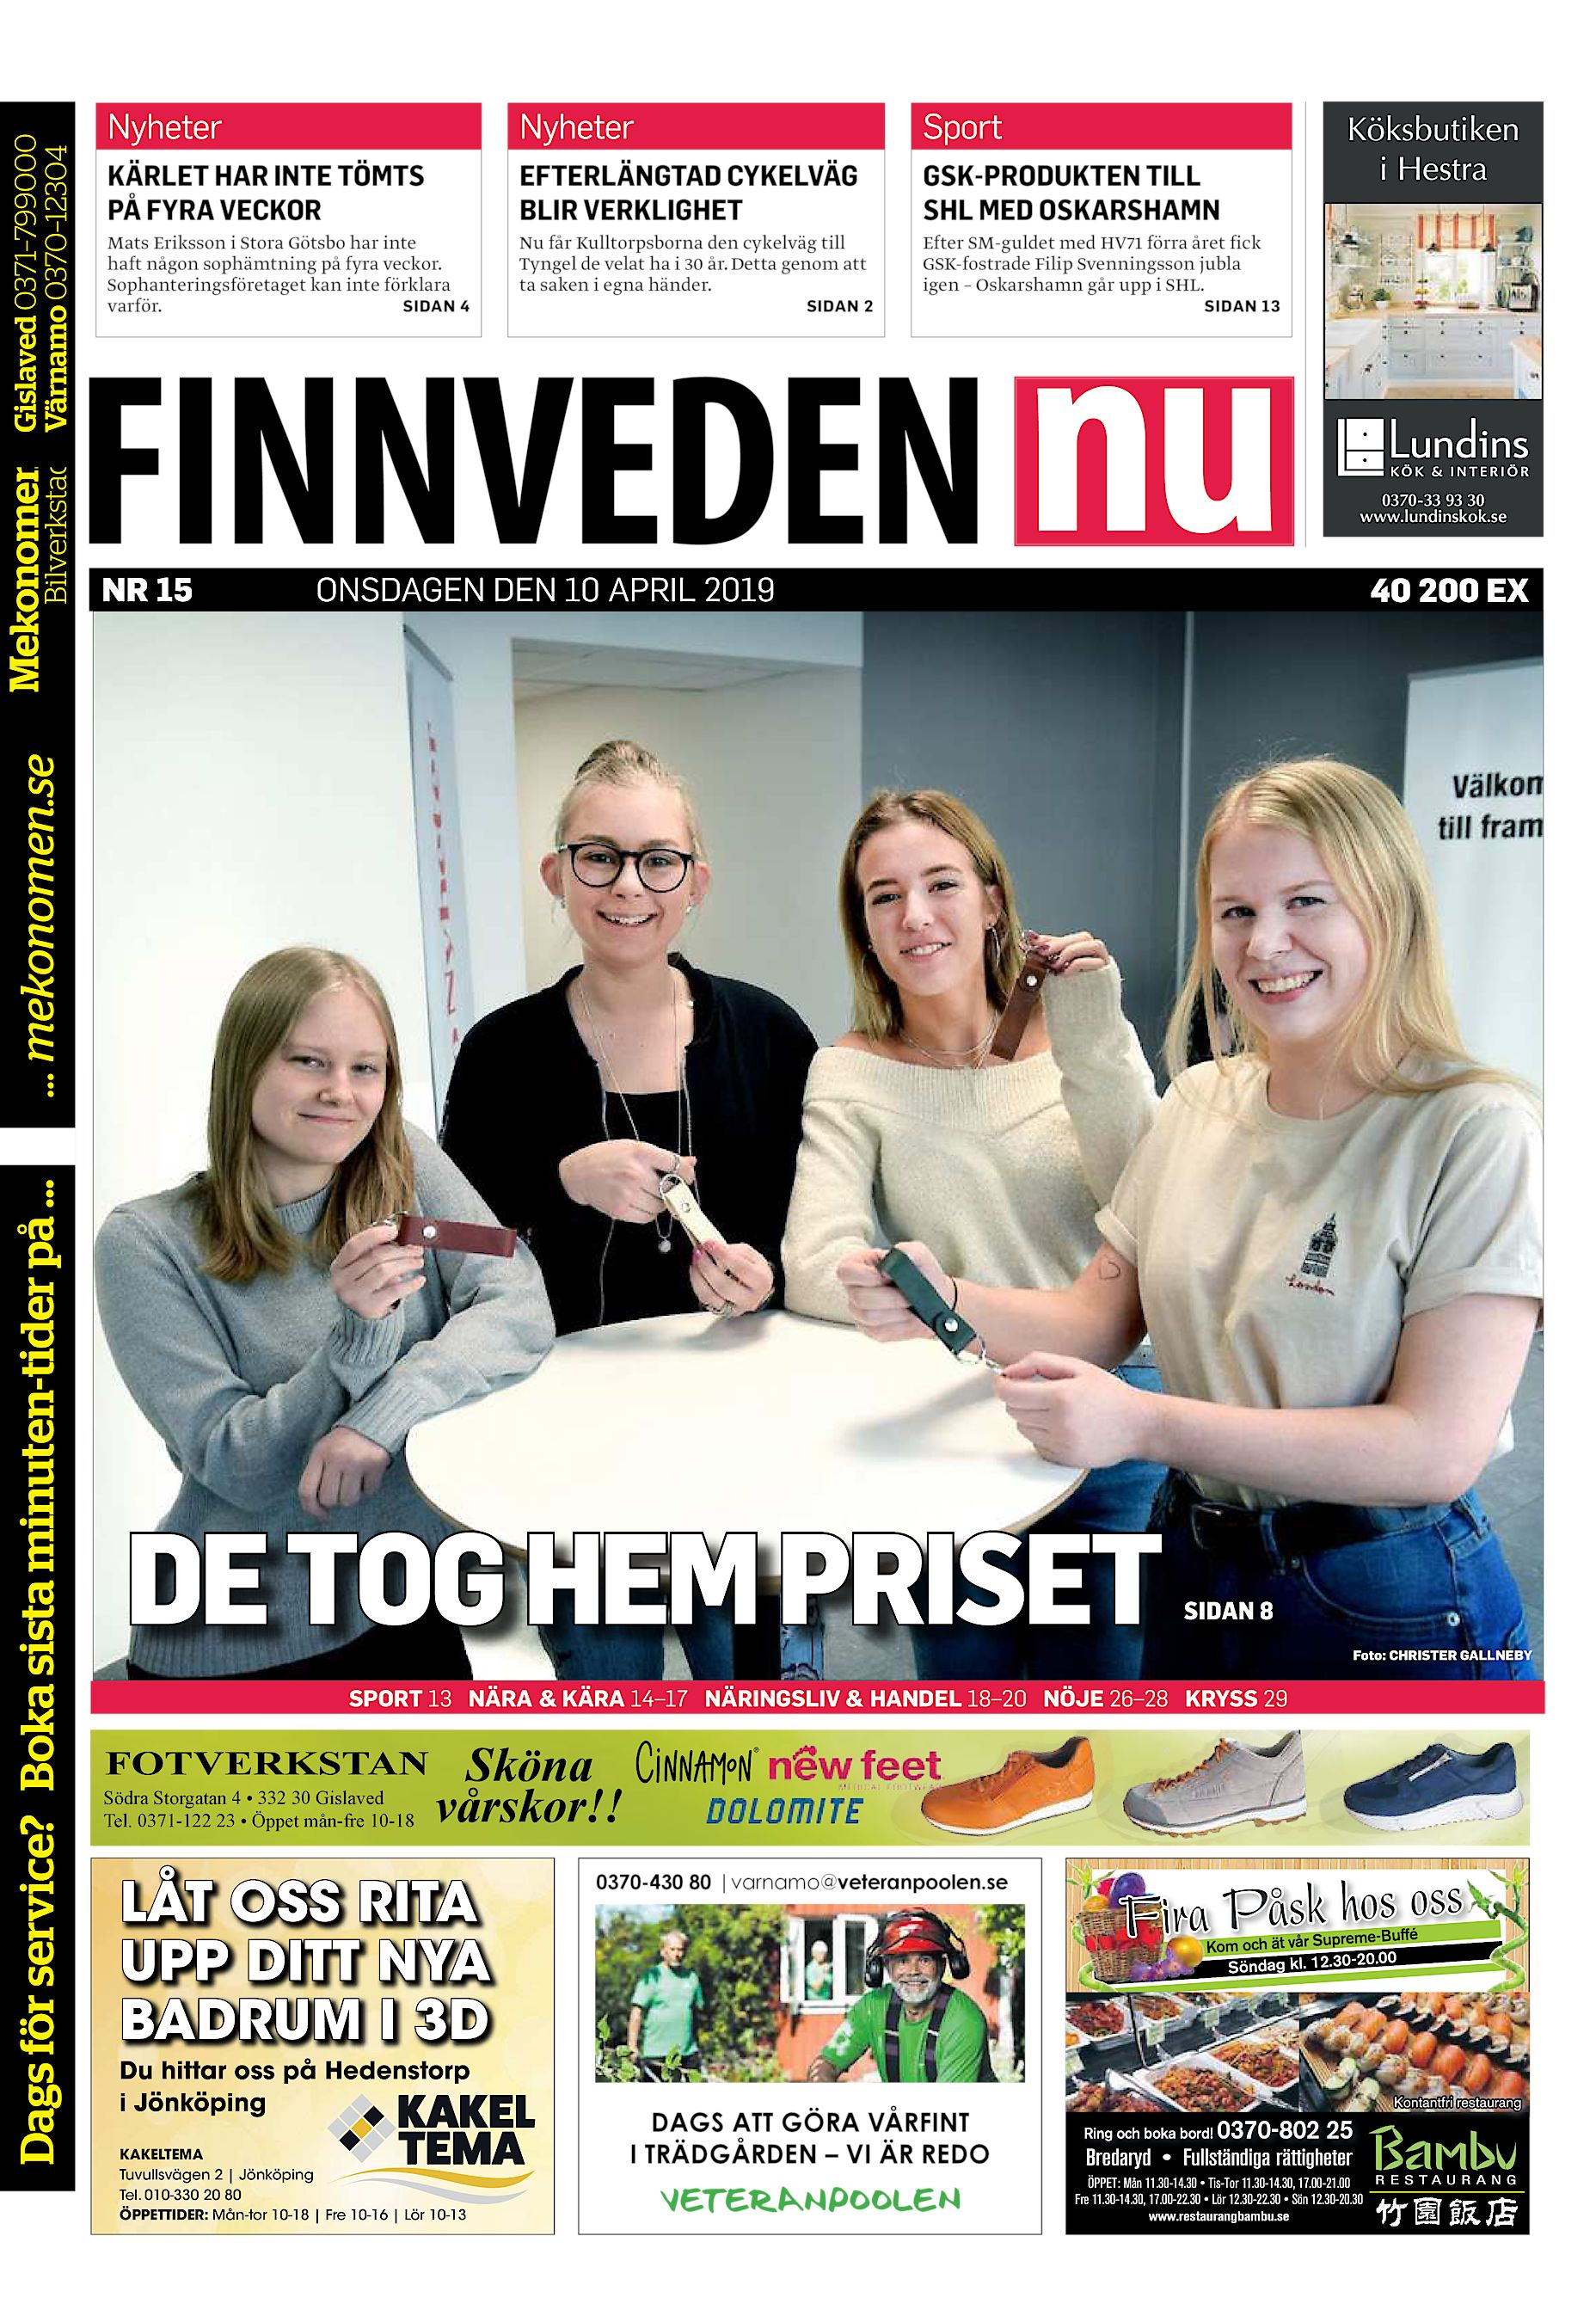 00177da47cc3 Finnveden.nu FNU-20190410 (endast text)